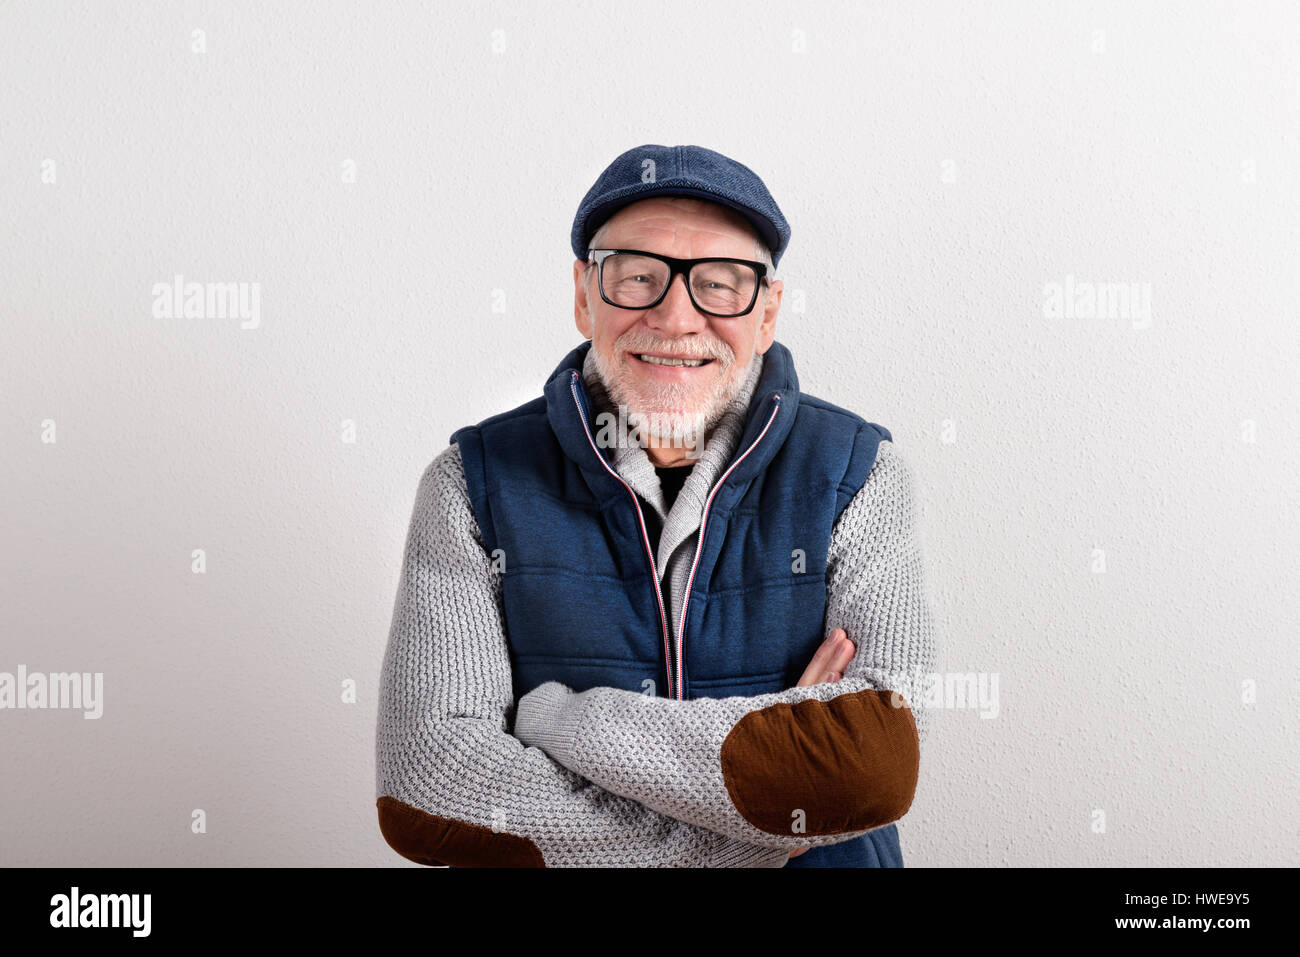 Senior man in sweater, vest jacket and cap, studio shot. - Stock Image